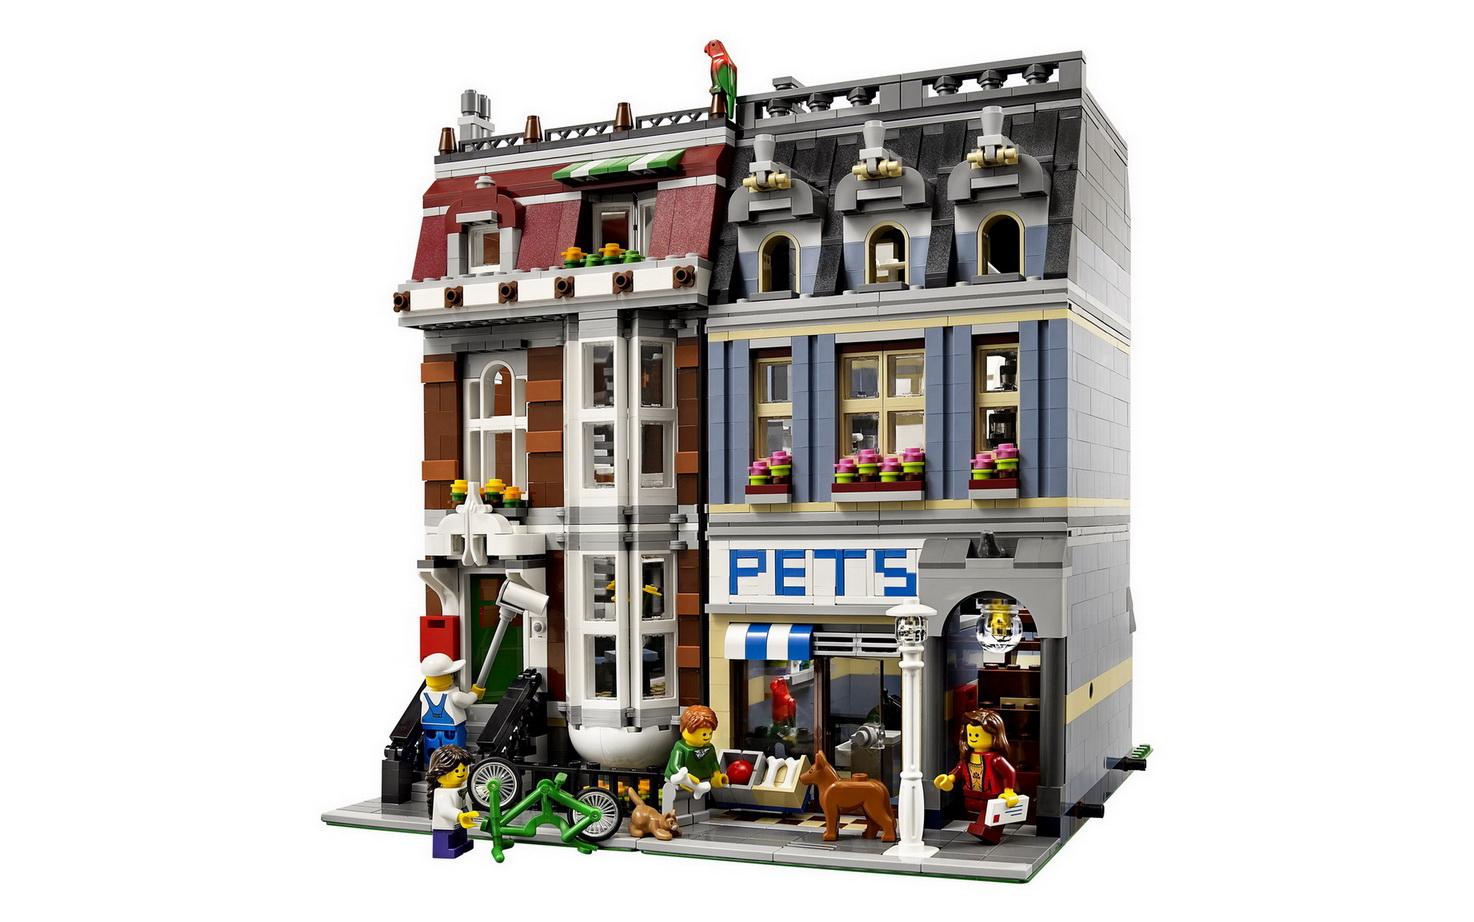 Raisable Coffee Table Pin Lego Pet Shop on Pinterest